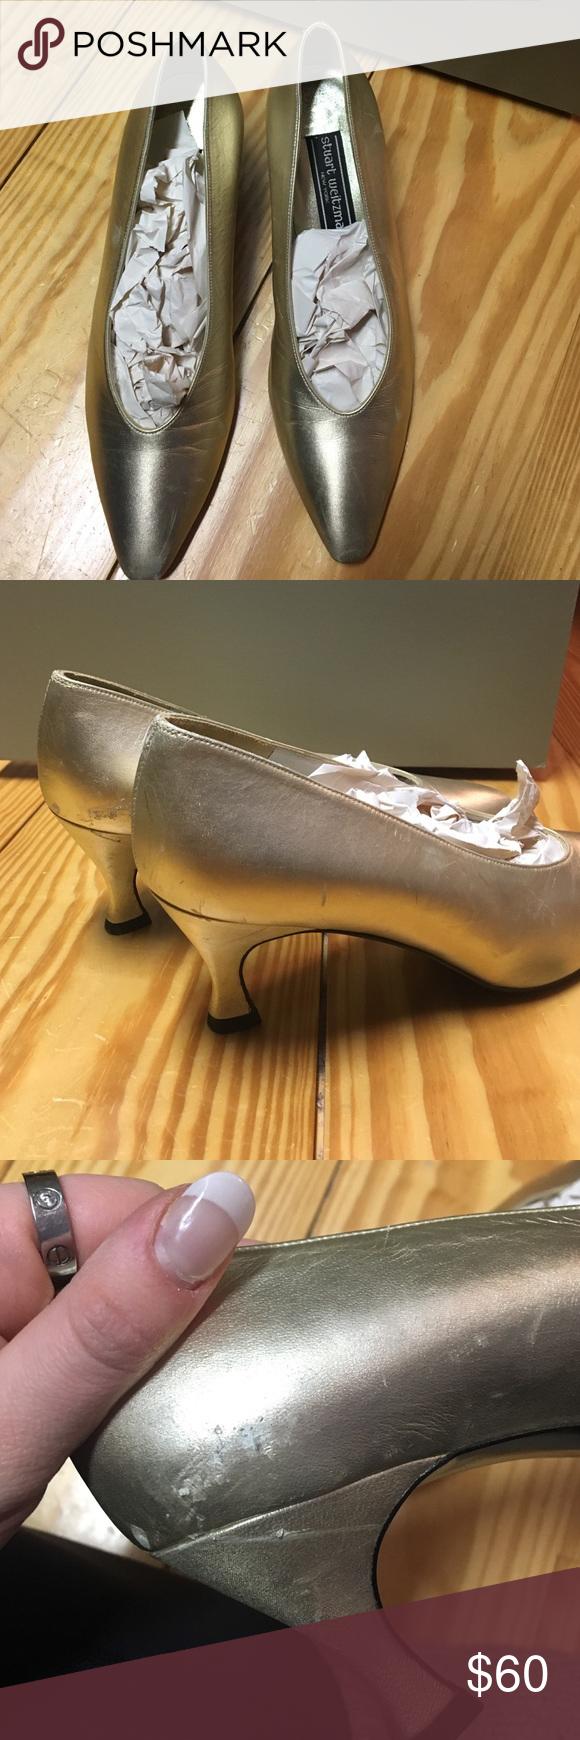 Stuart Weitzman Heels Gold tone, Stuart weitzman pumps, size 8, vintage, little wear on one side Stuart Weitzman Shoes Heels